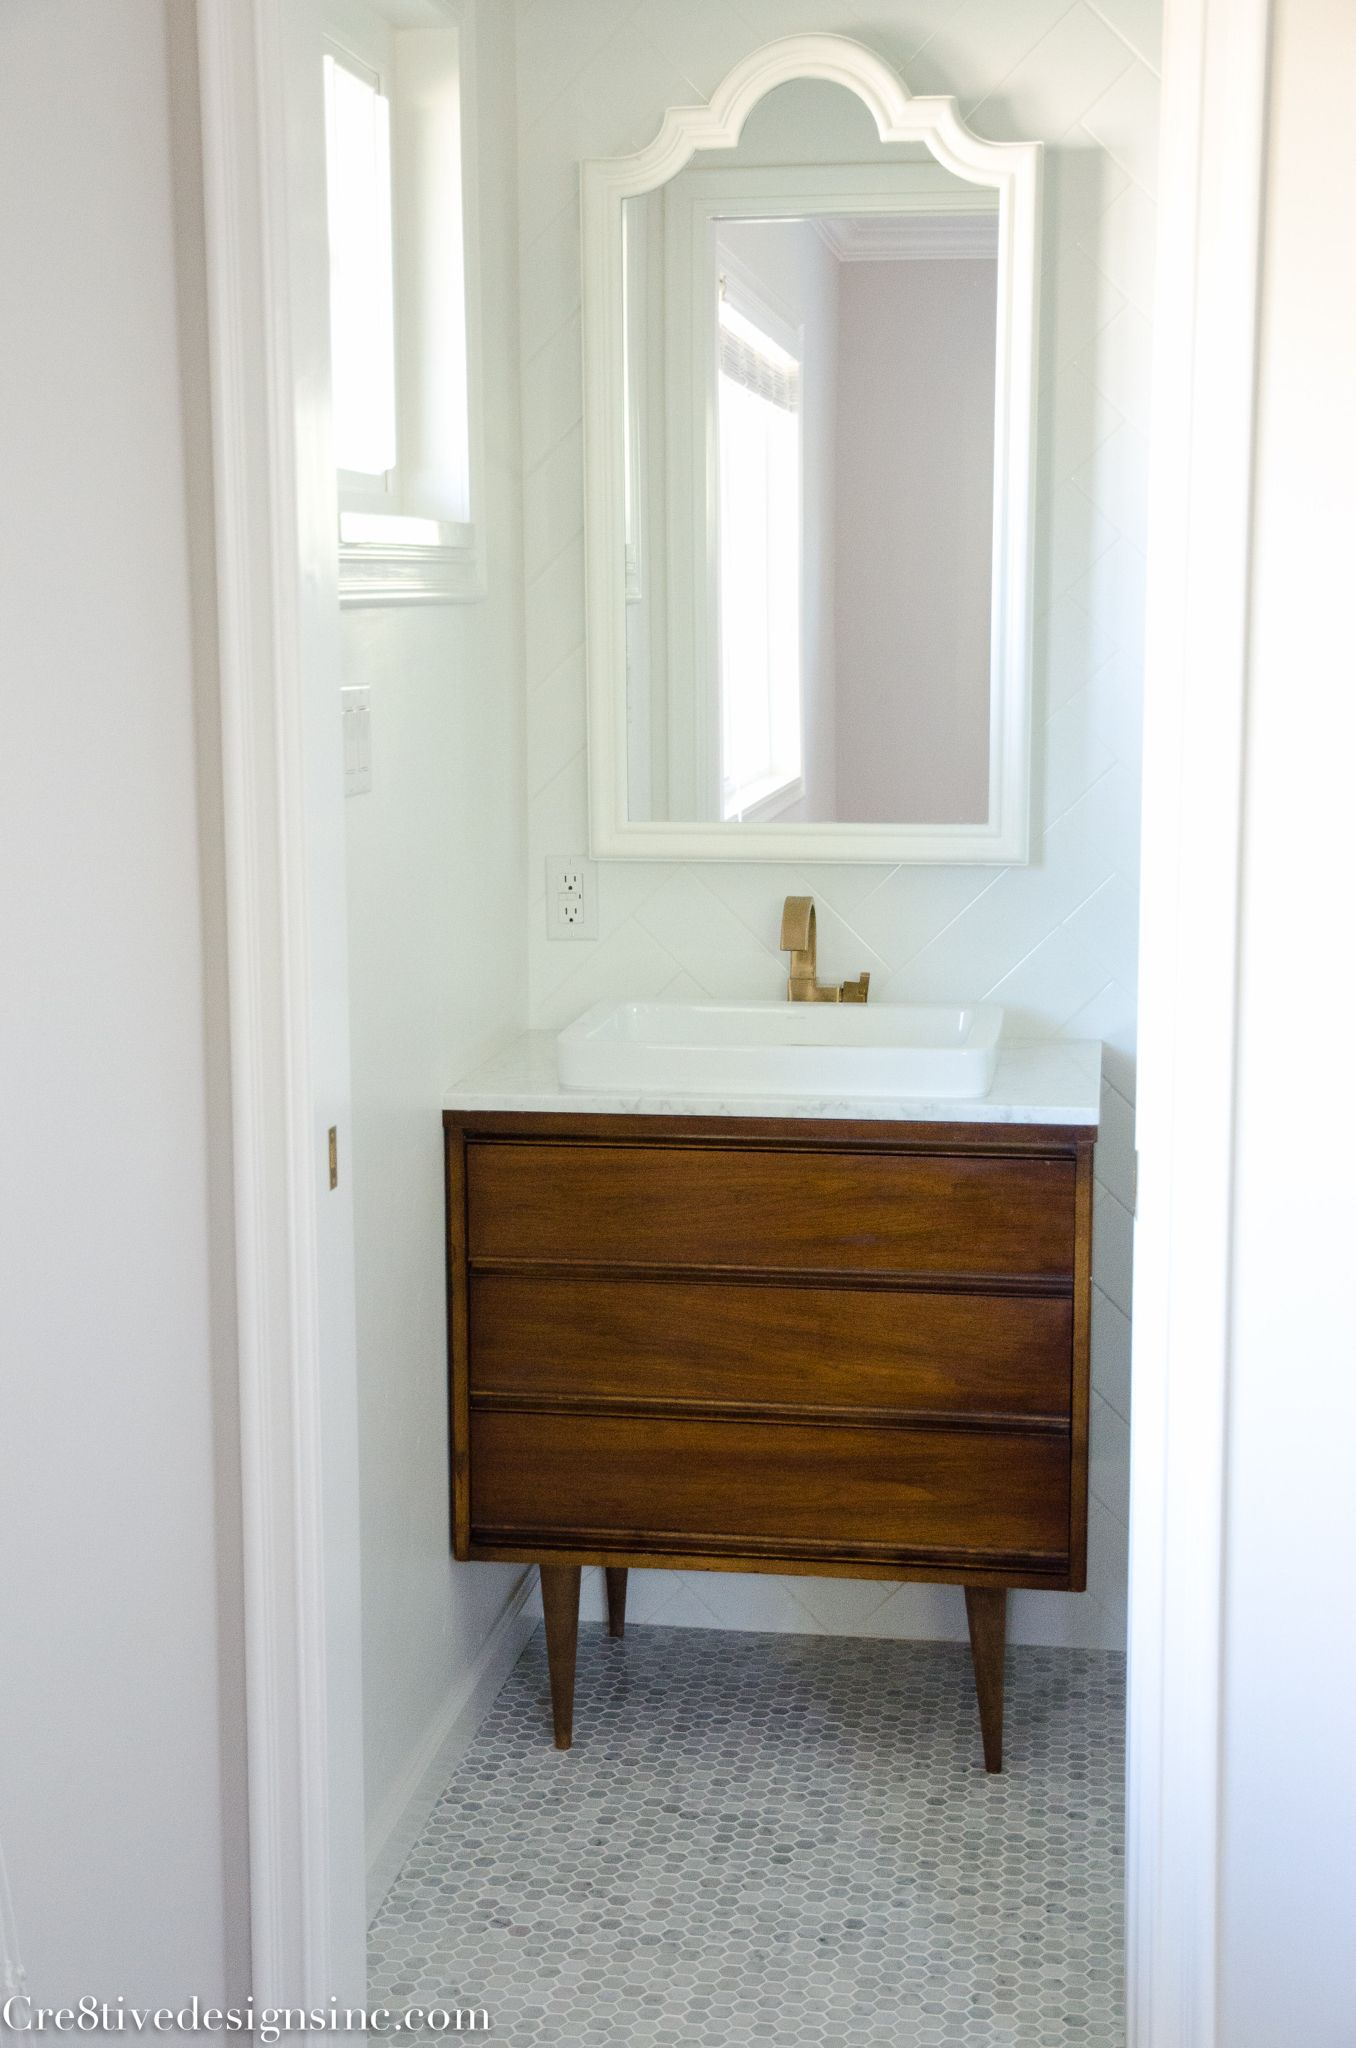 For guest bath | bathroom ideas | Pinterest | Guest bath, Bath and ...